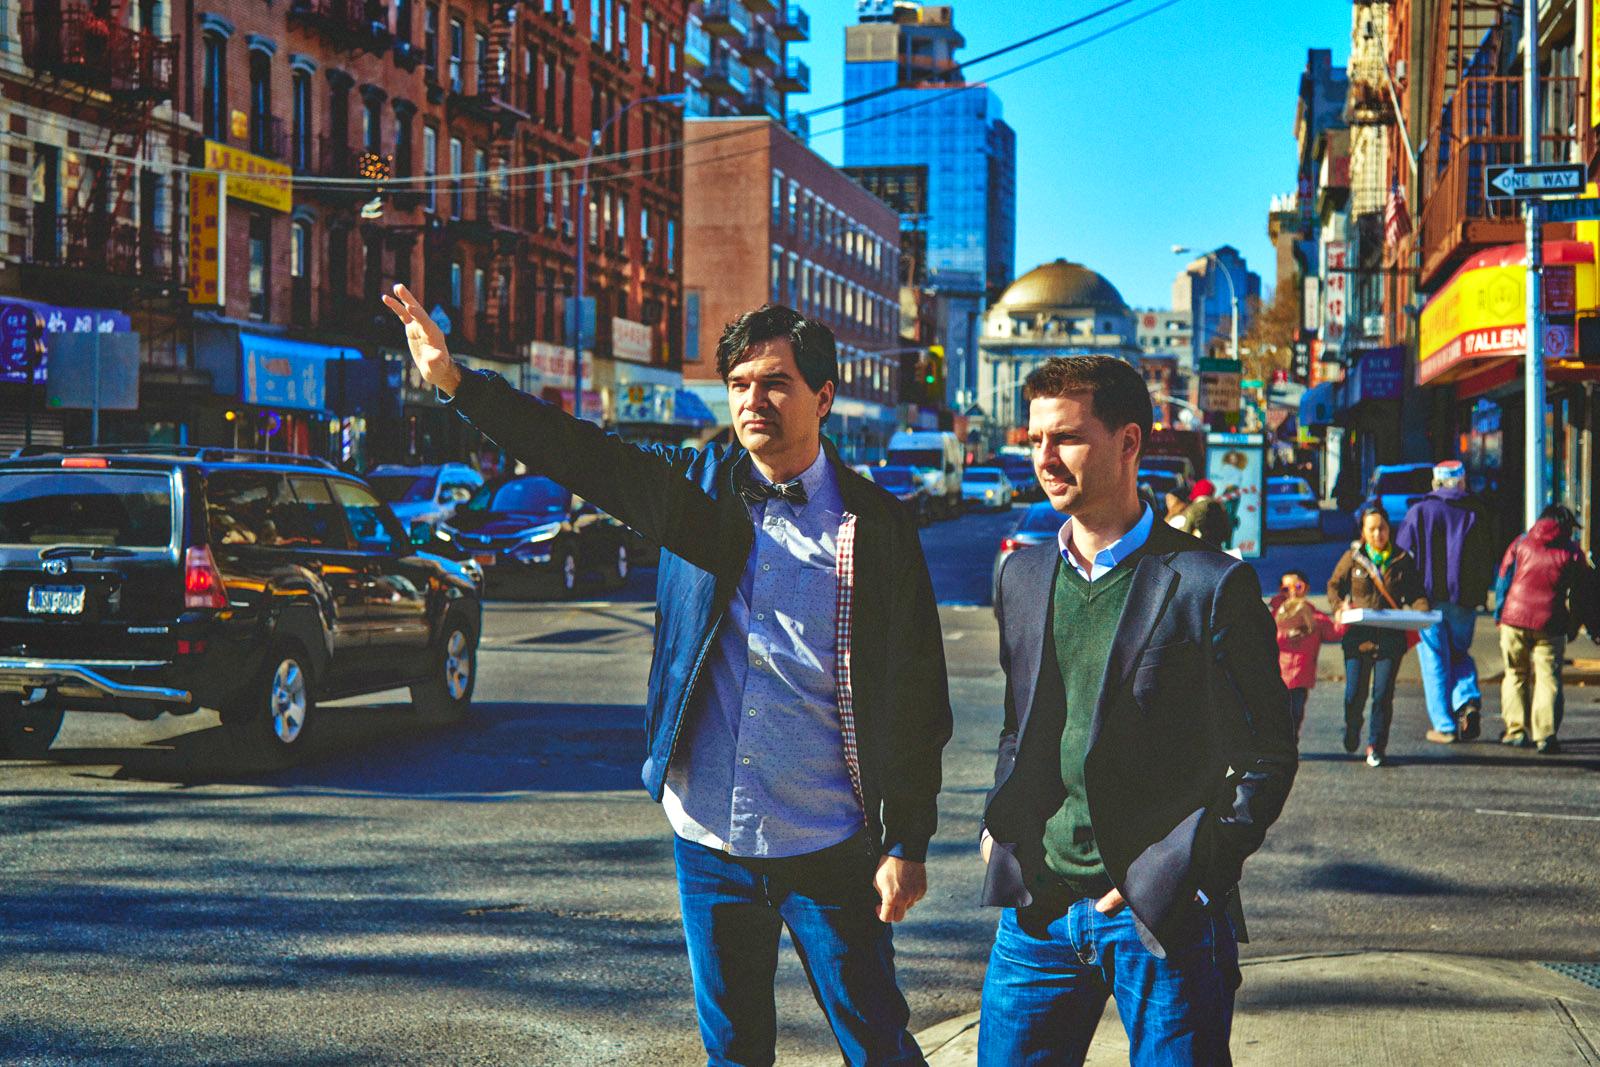 Bowery Boys